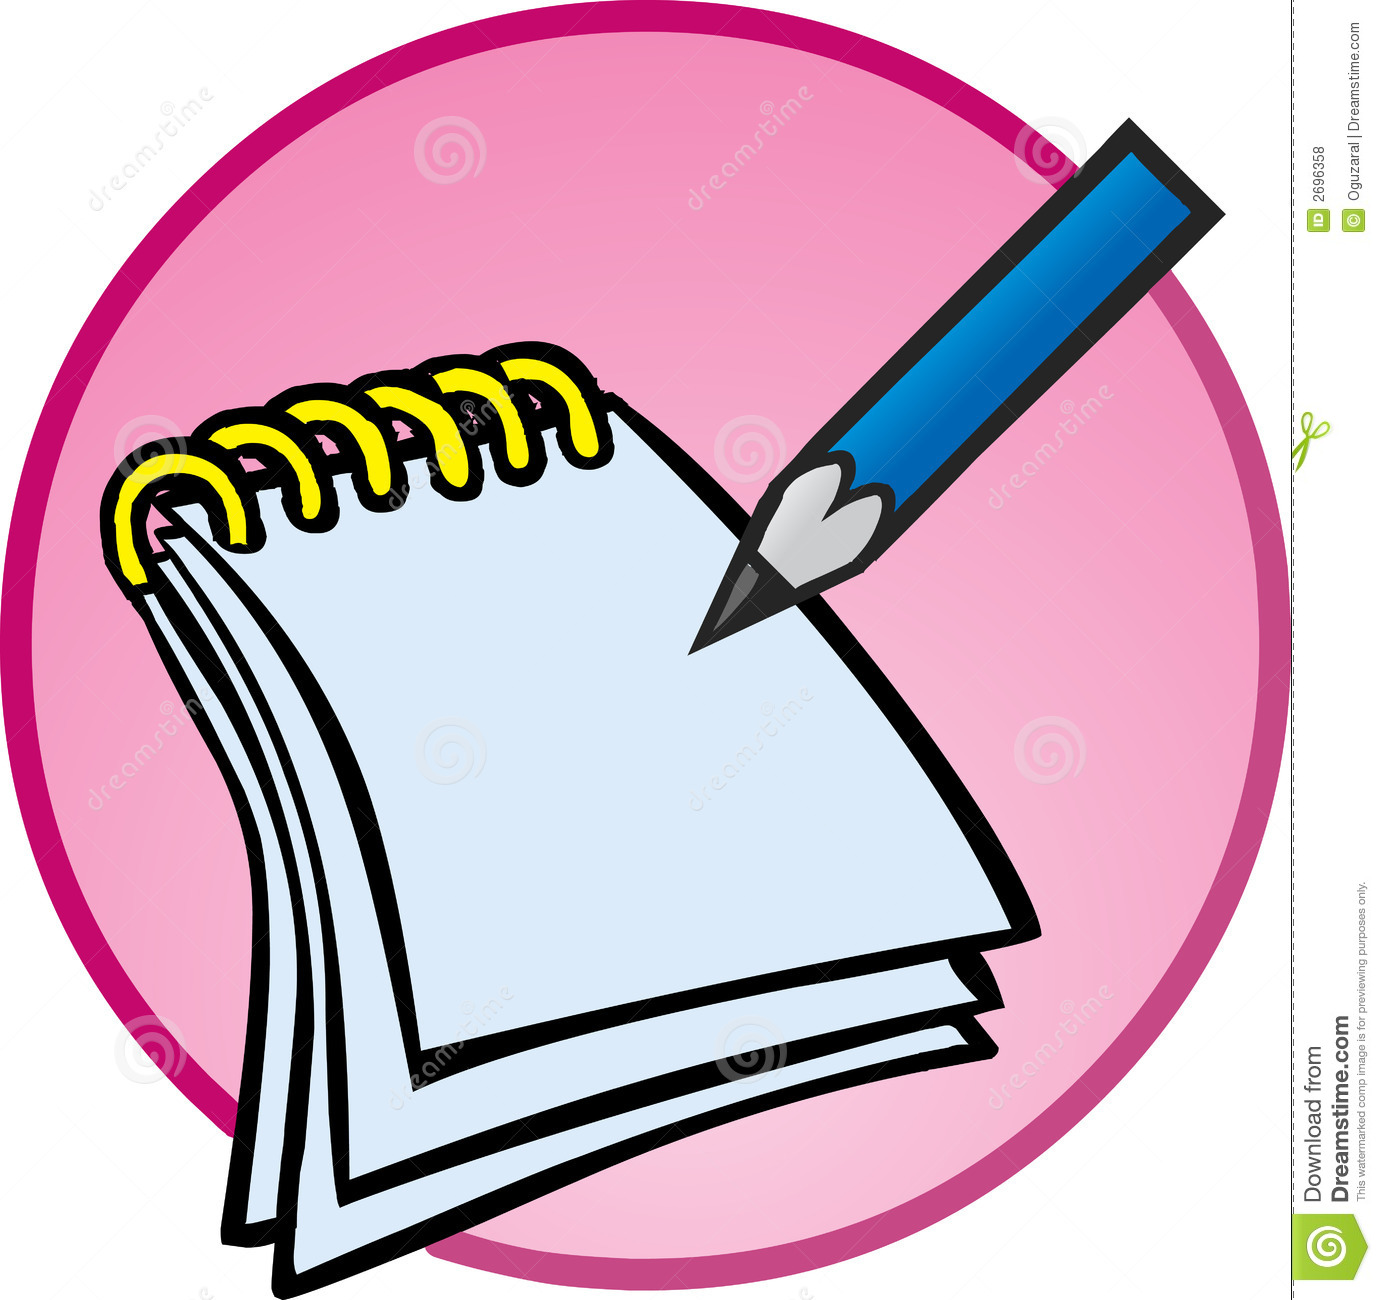 Notepads clipart